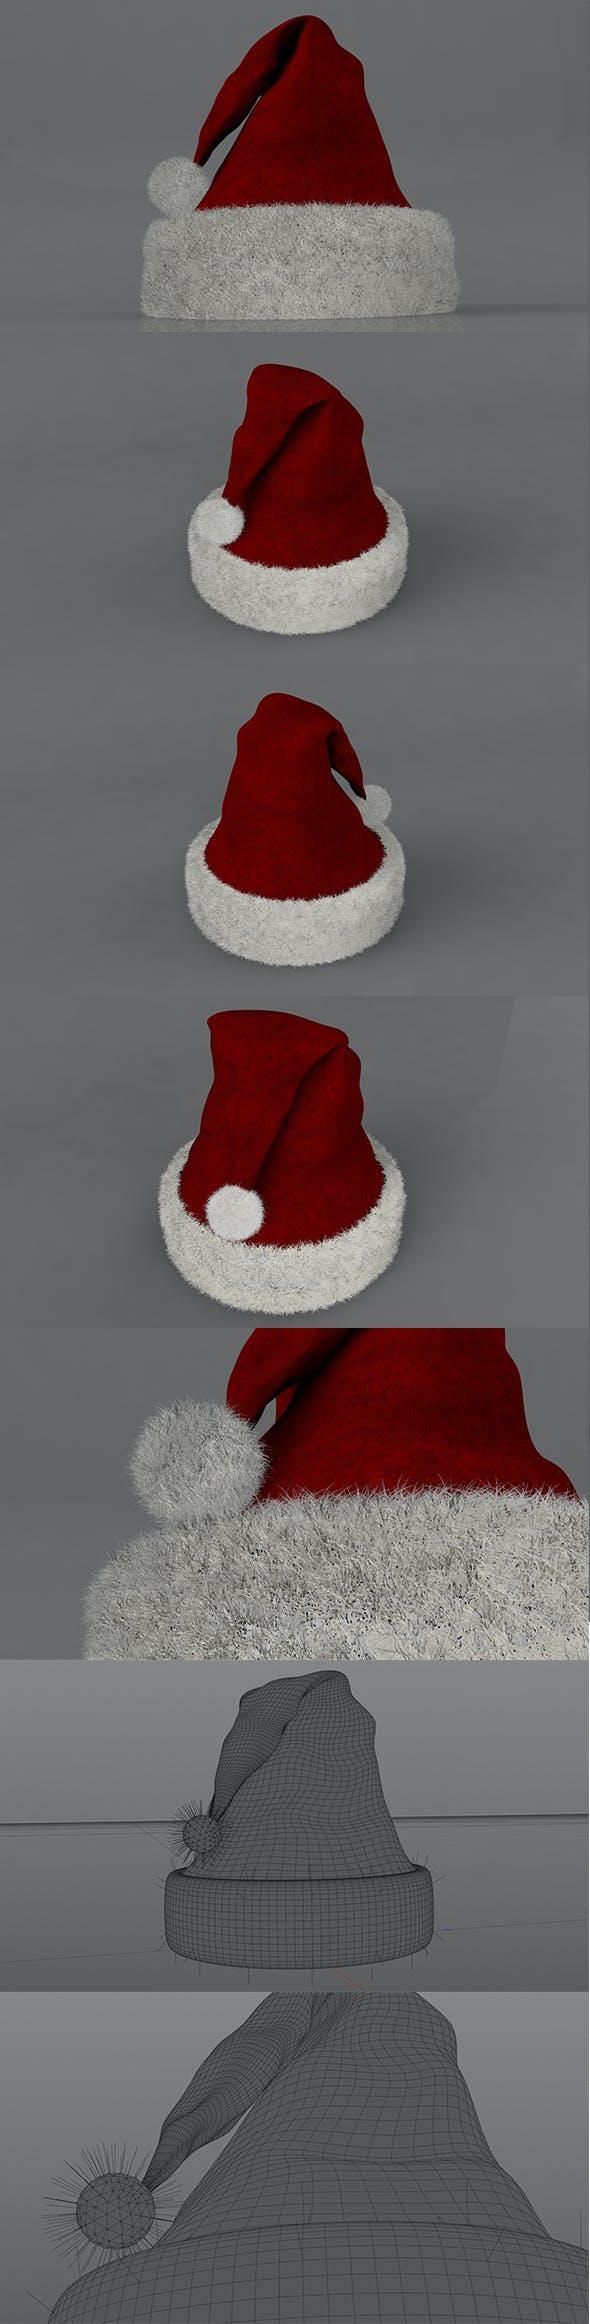 3D Christmas Hat - 3DOcean Item for Sale